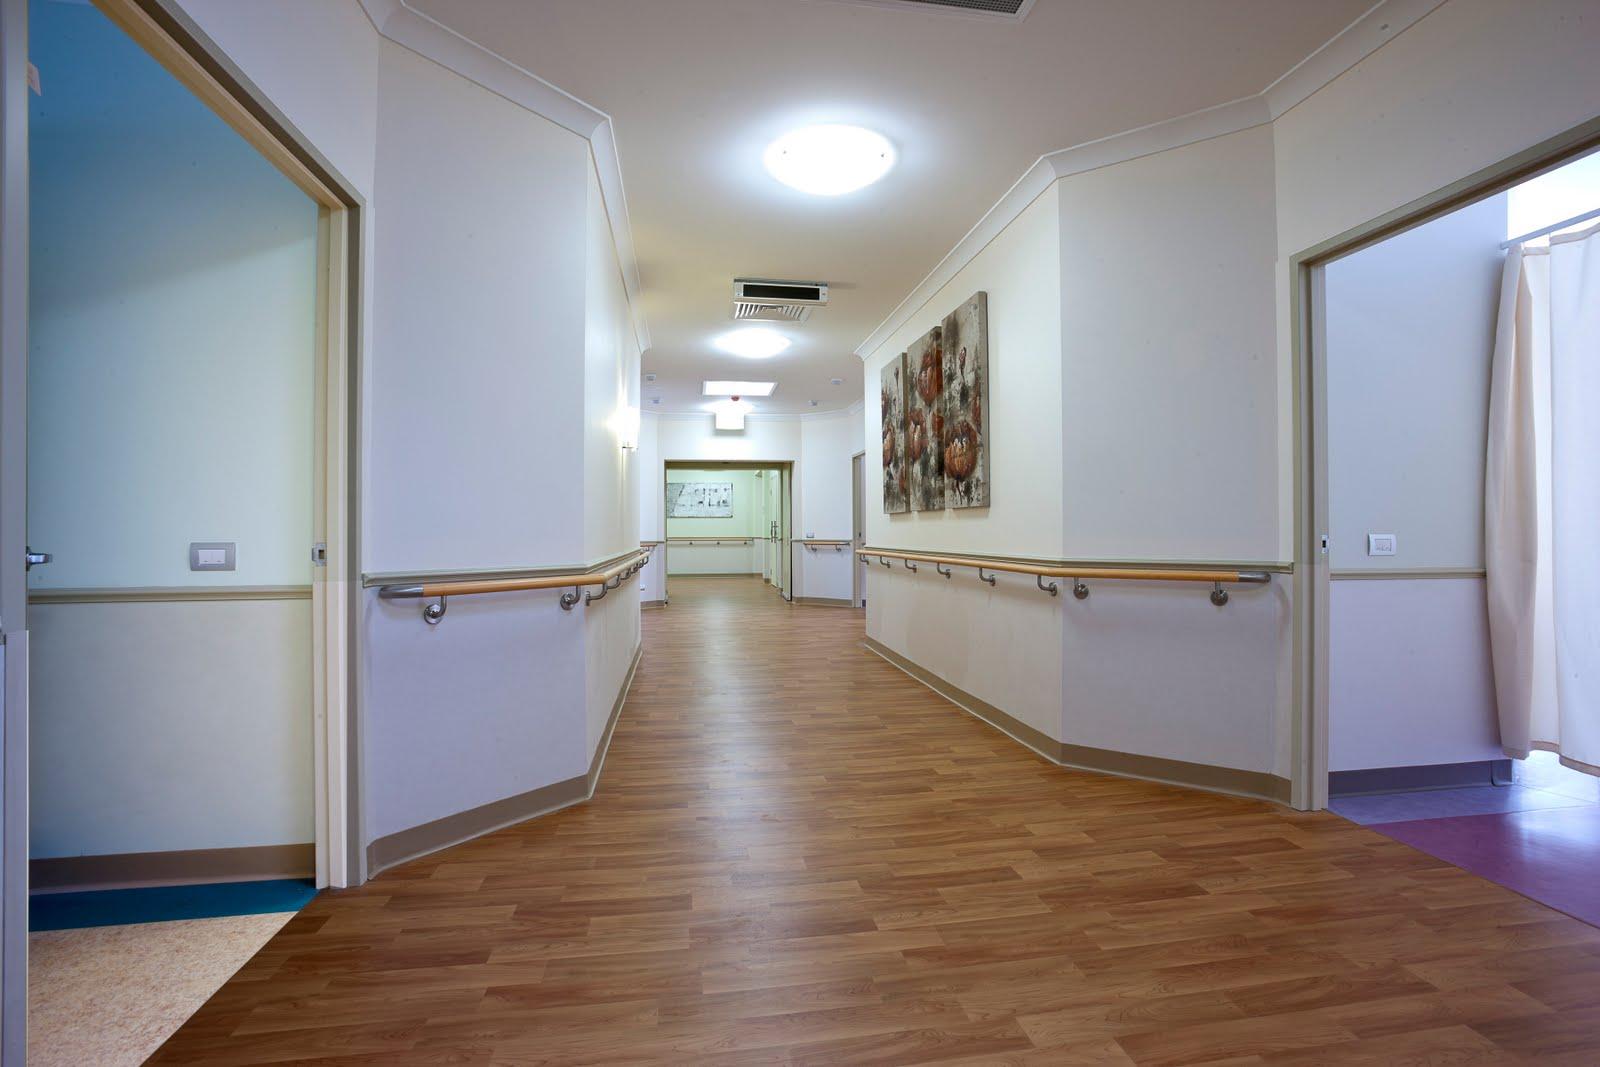 Vinyl Flooring Service : Carpet tiles perth vinyl flooring commercial